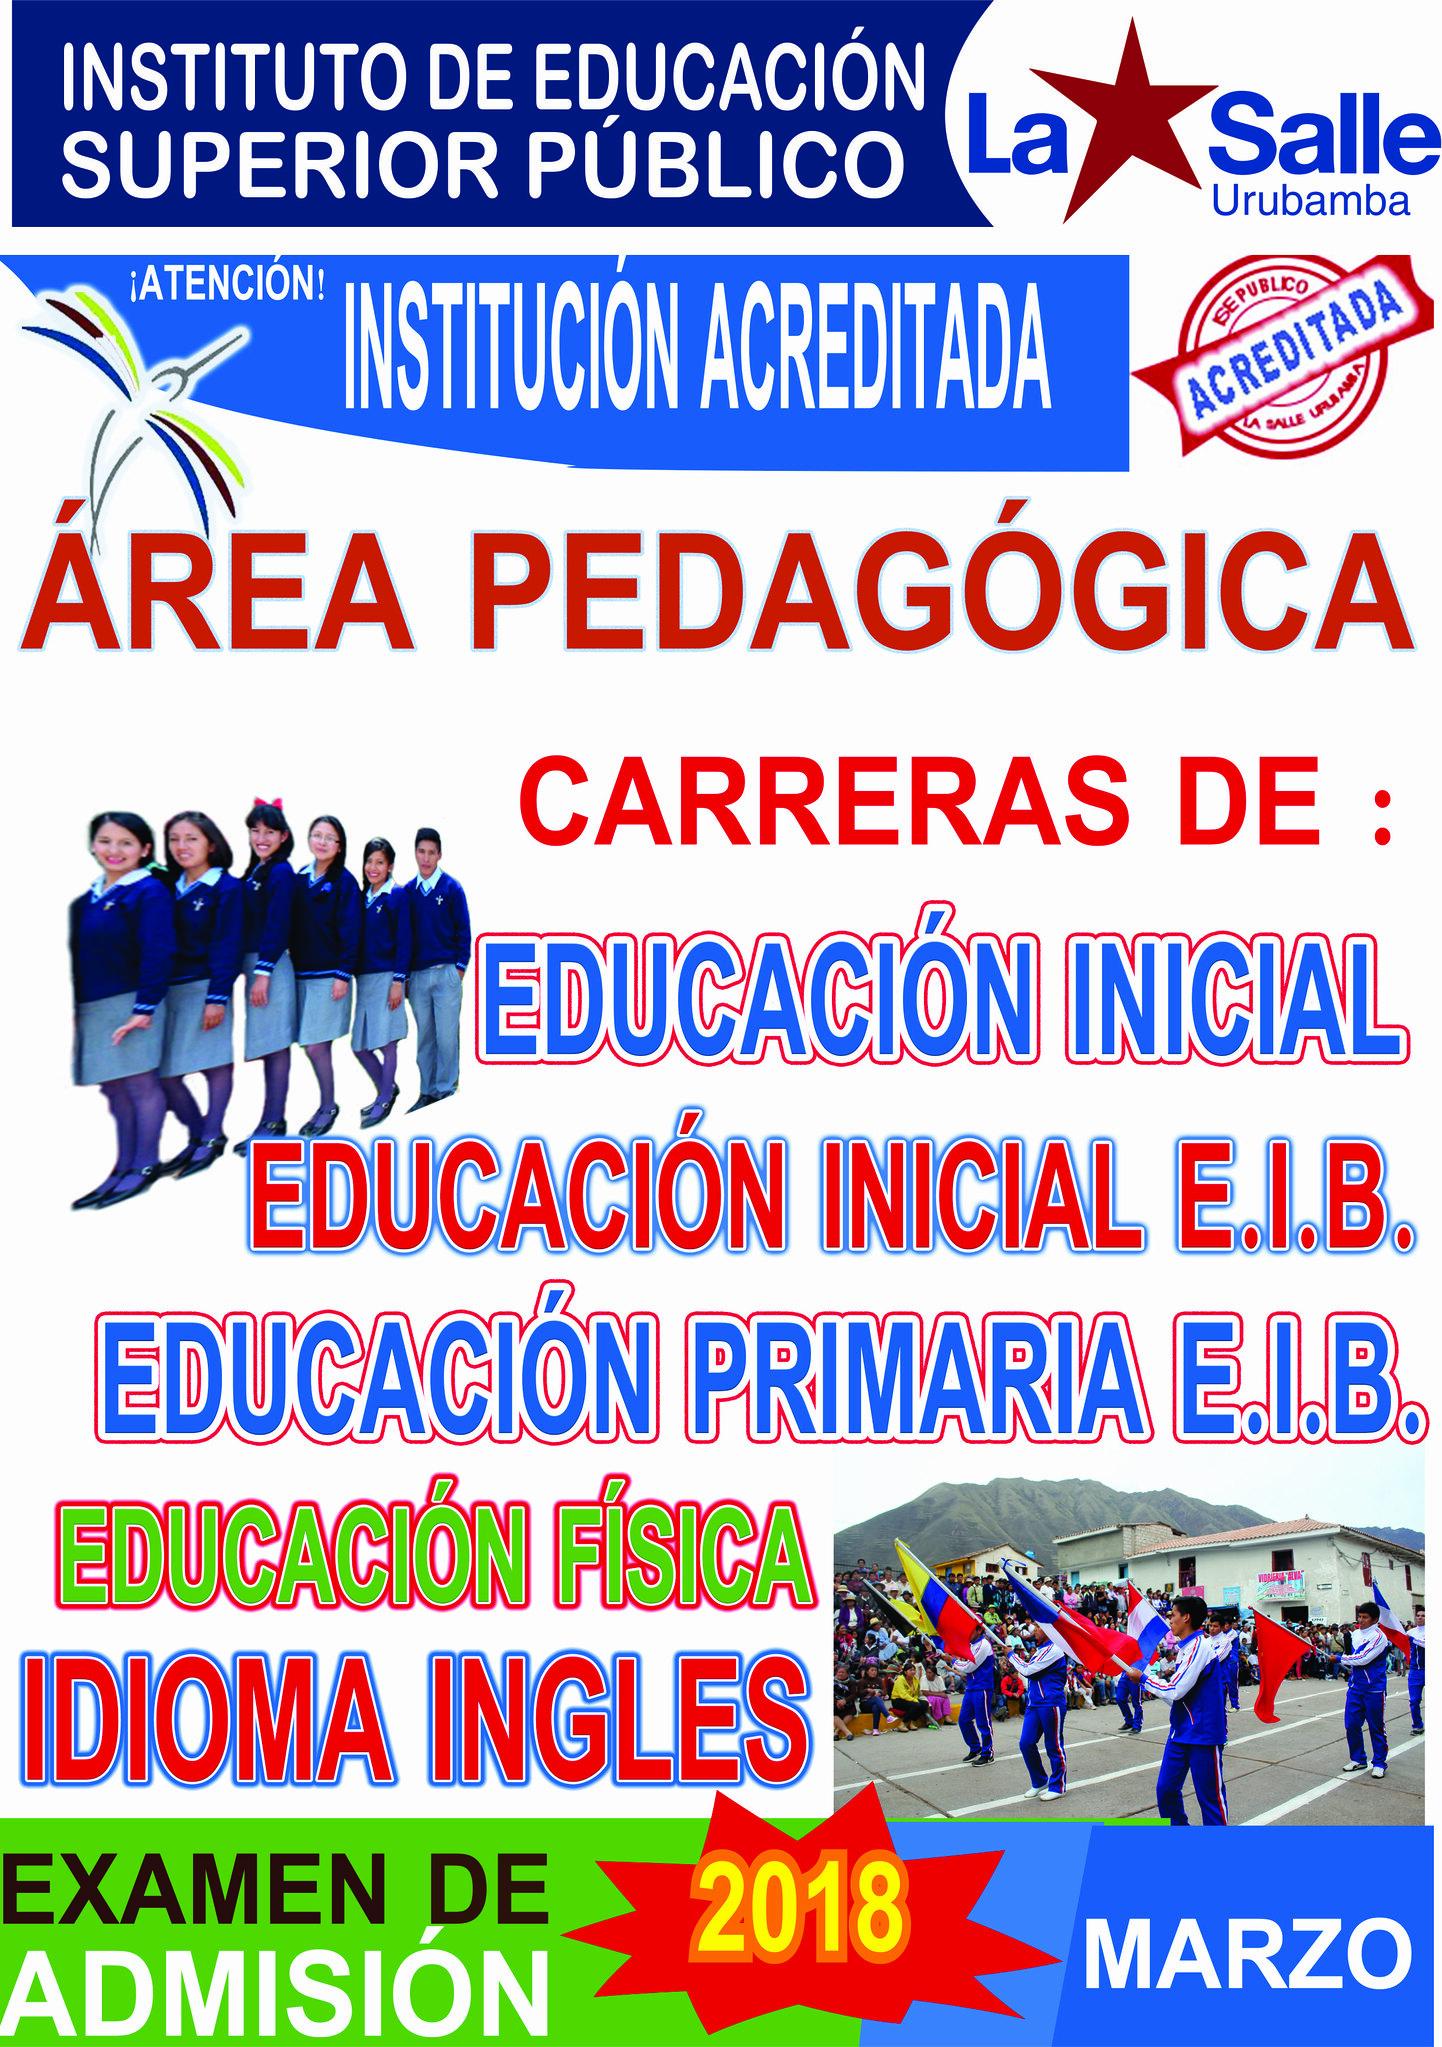 PublicidadSalle2018_Portada2_BannerPedagogico